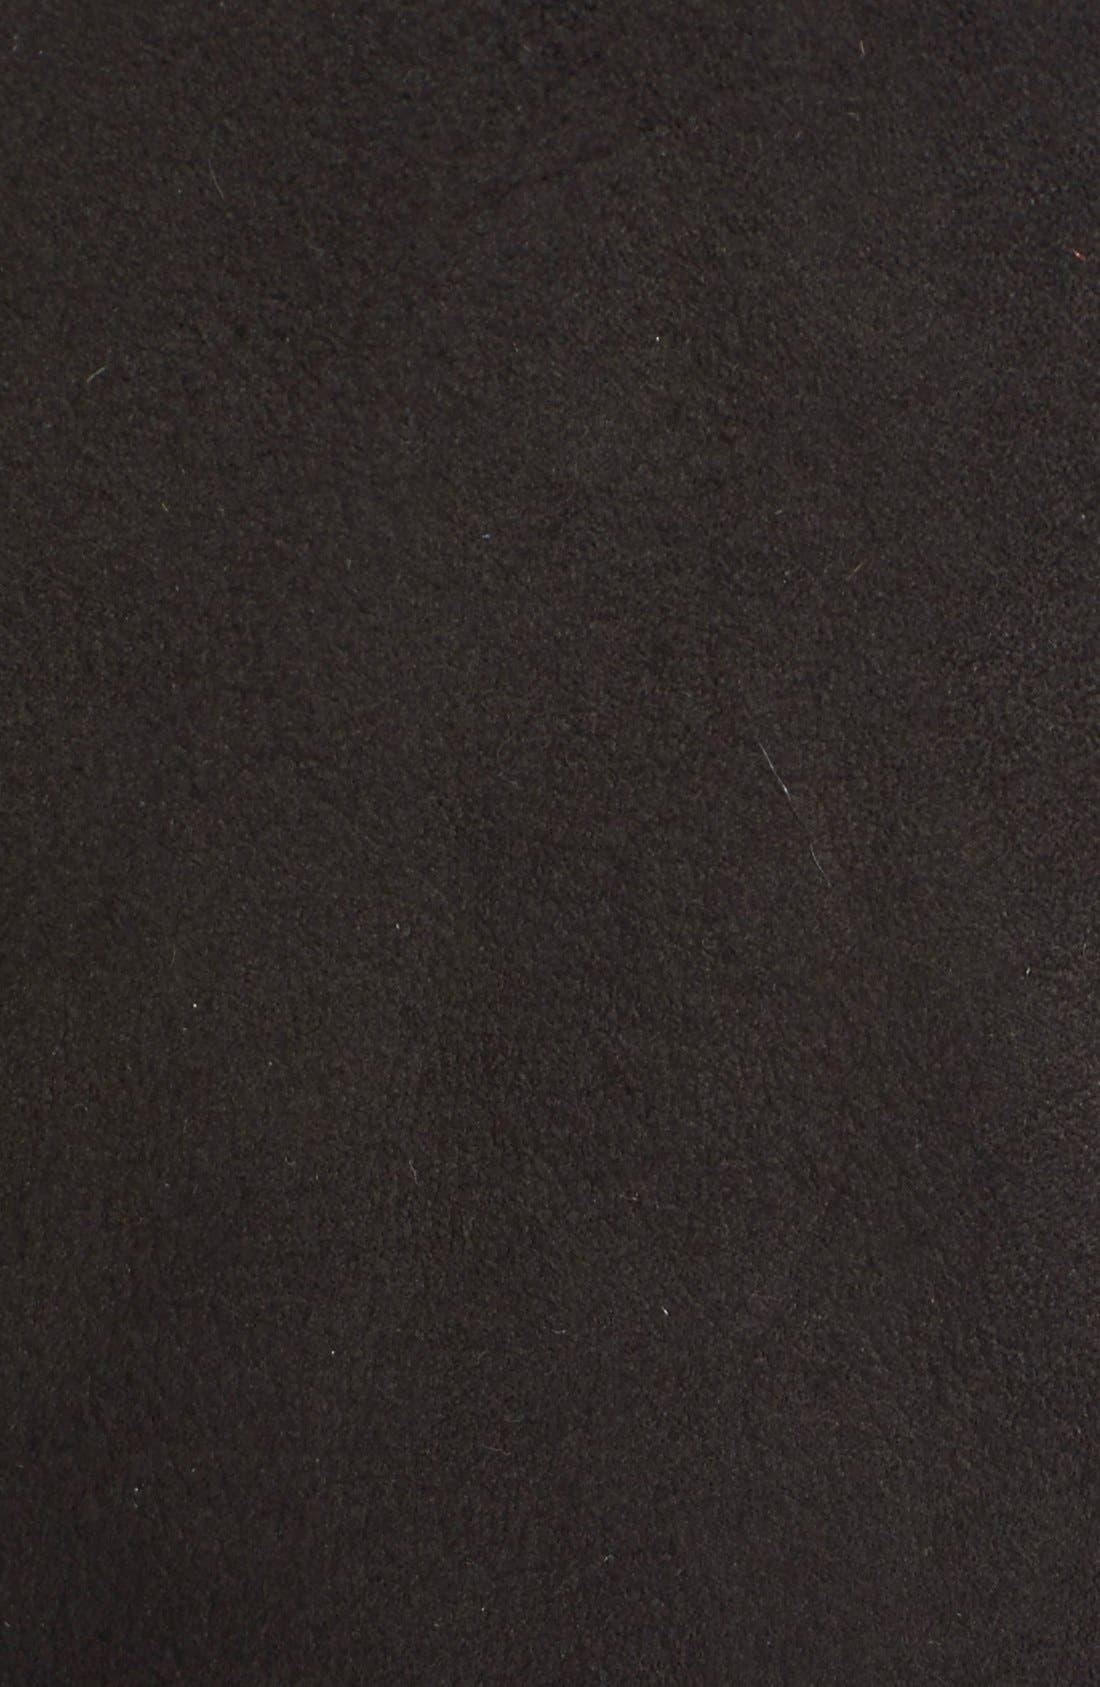 Alternate Image 3  - BurberryLondon 'Helmington' Collarless Belted Genuine ShearlingCoat